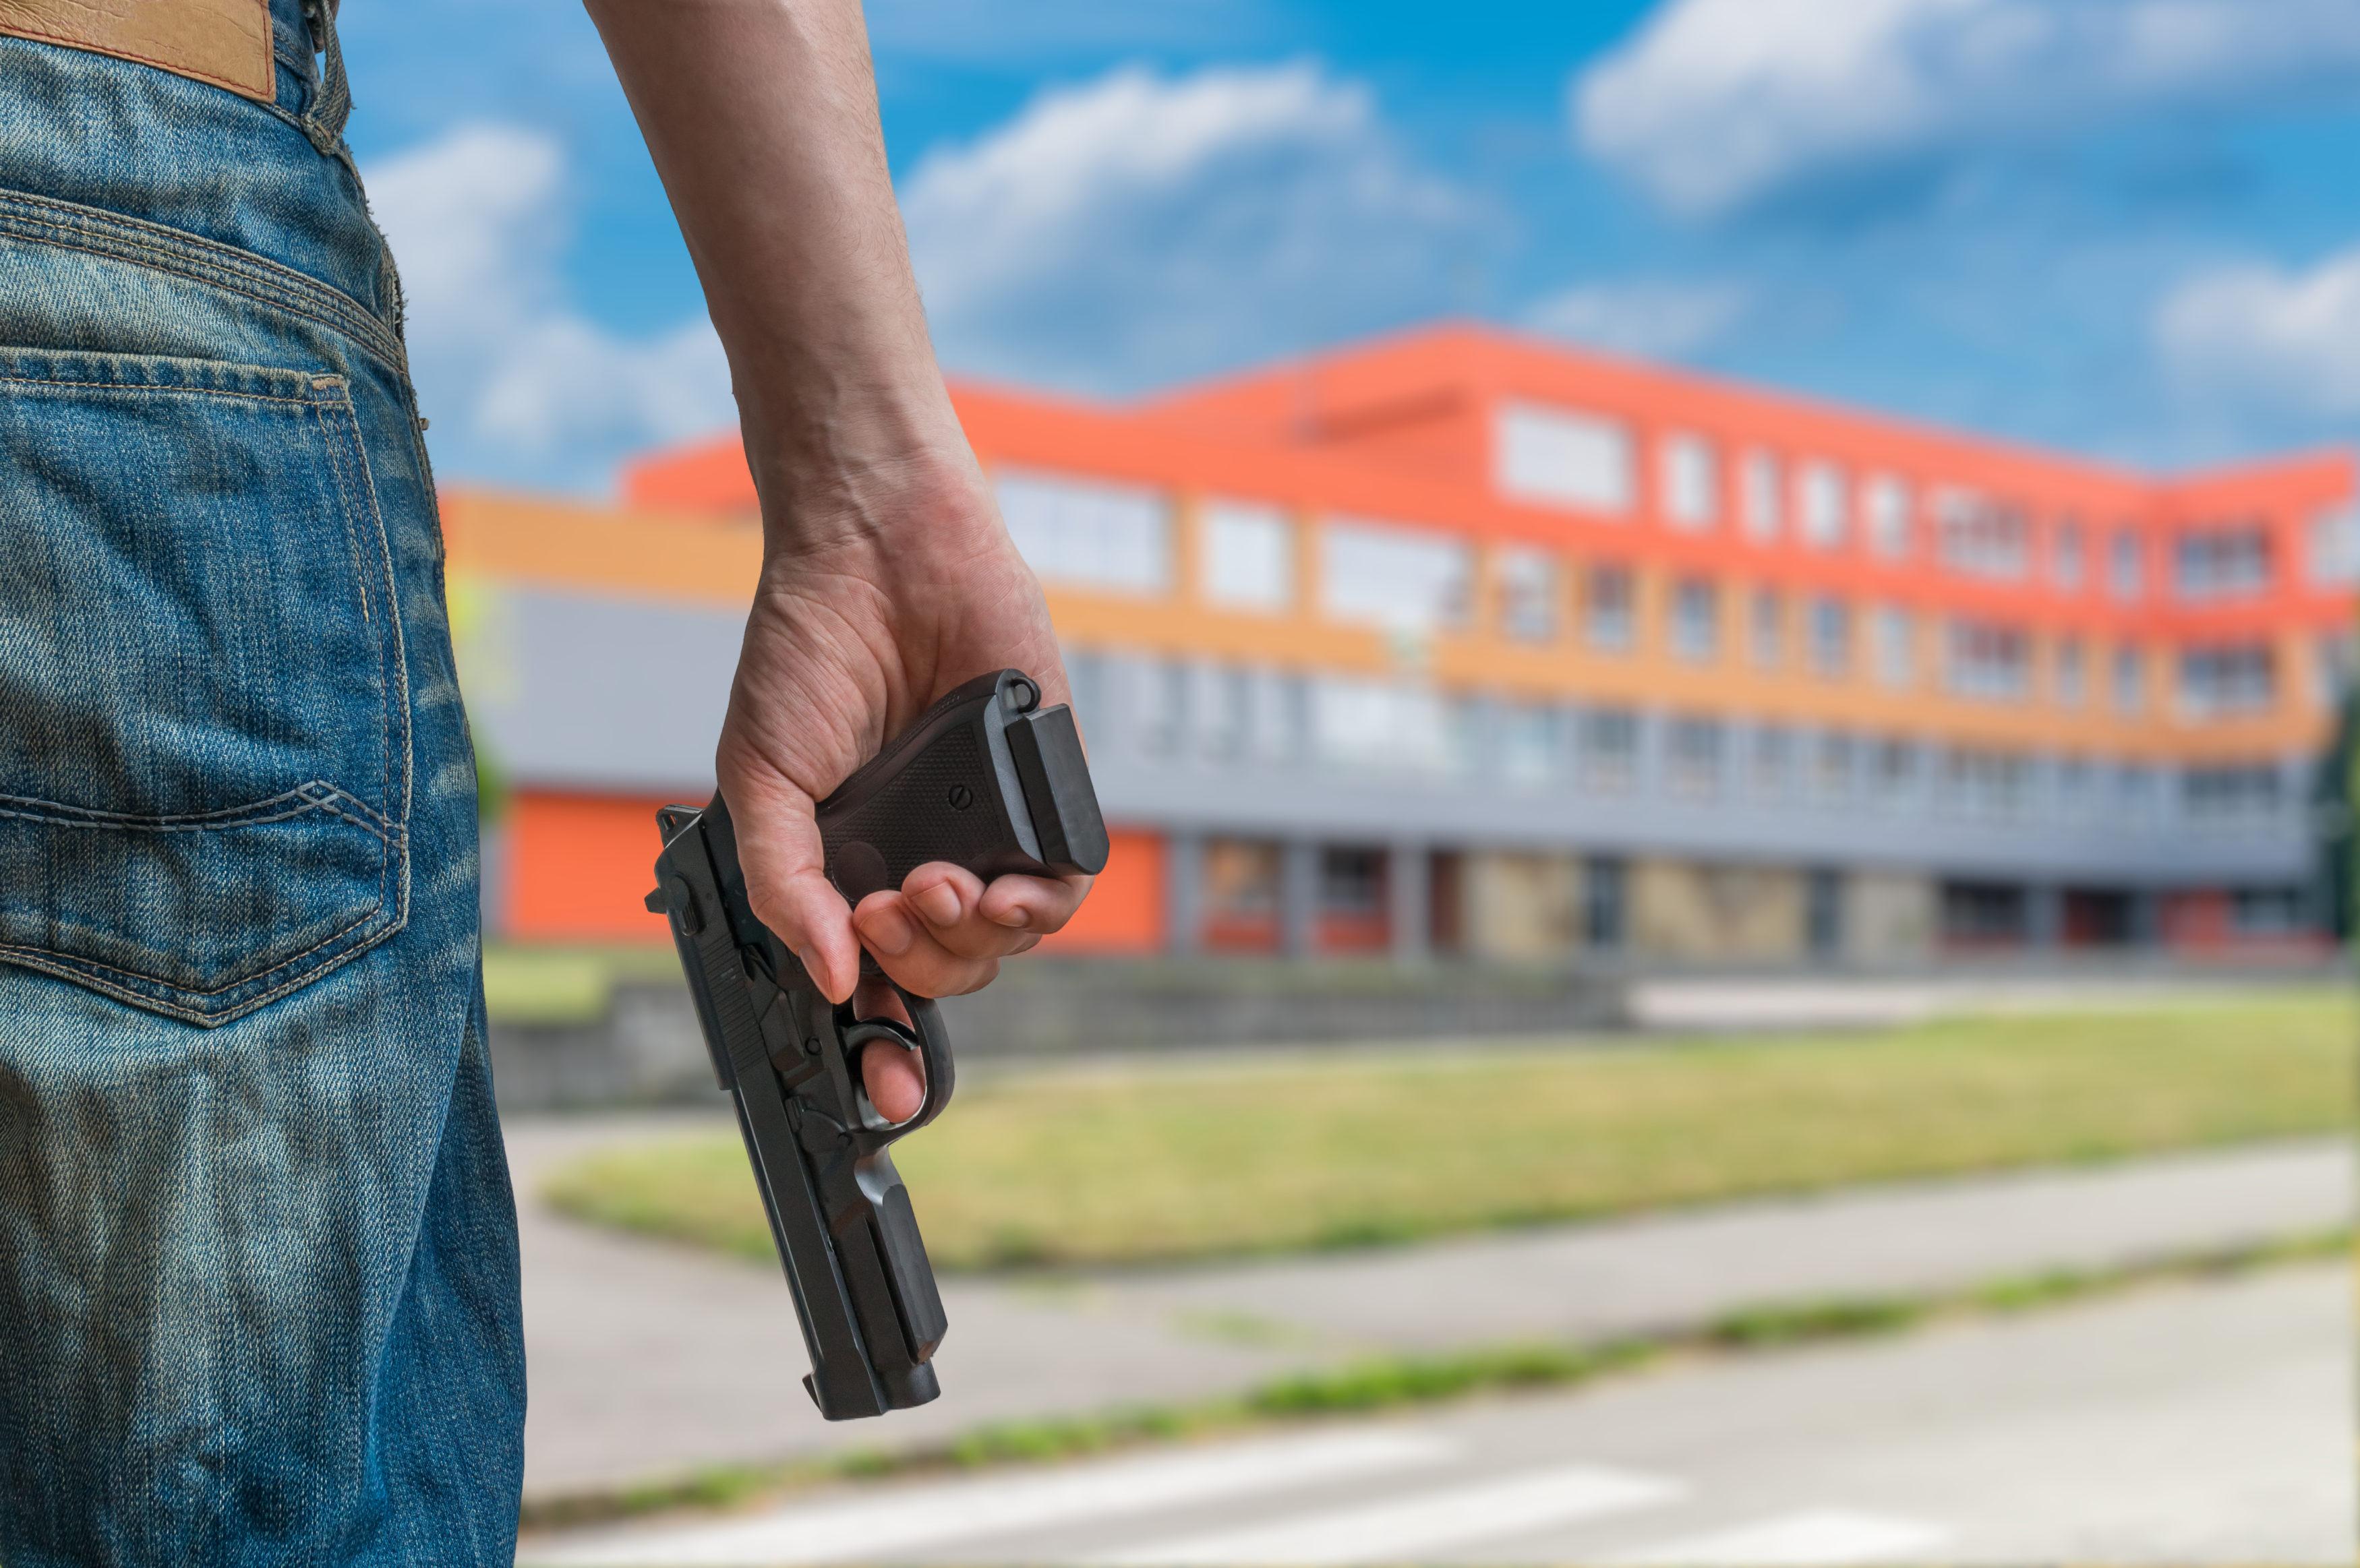 middle-school-shooting-3500x2326.jpg